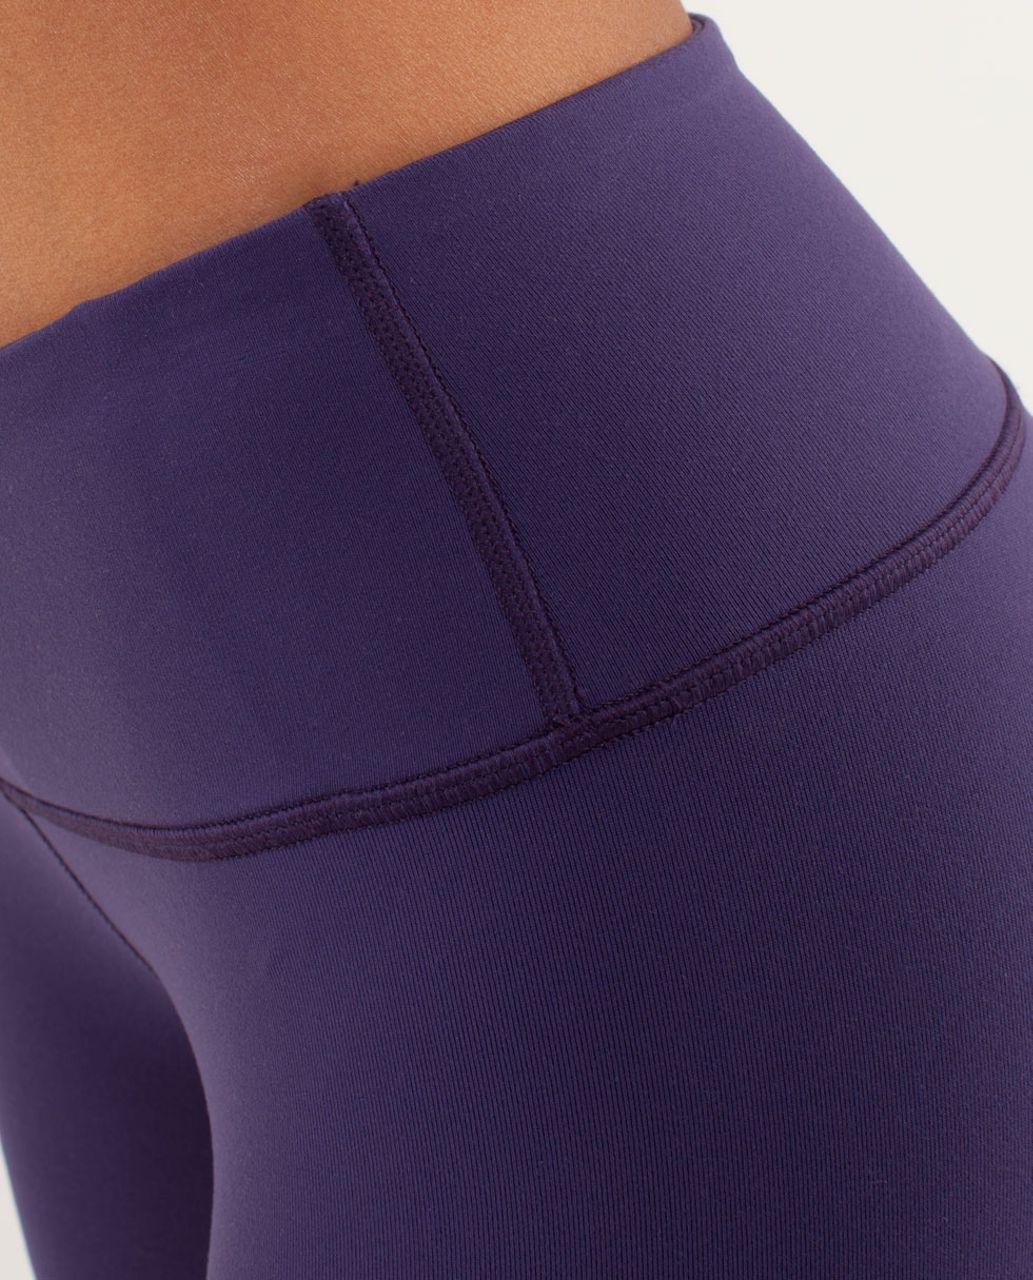 Lululemon Wunder Under Pant - Dense Purple